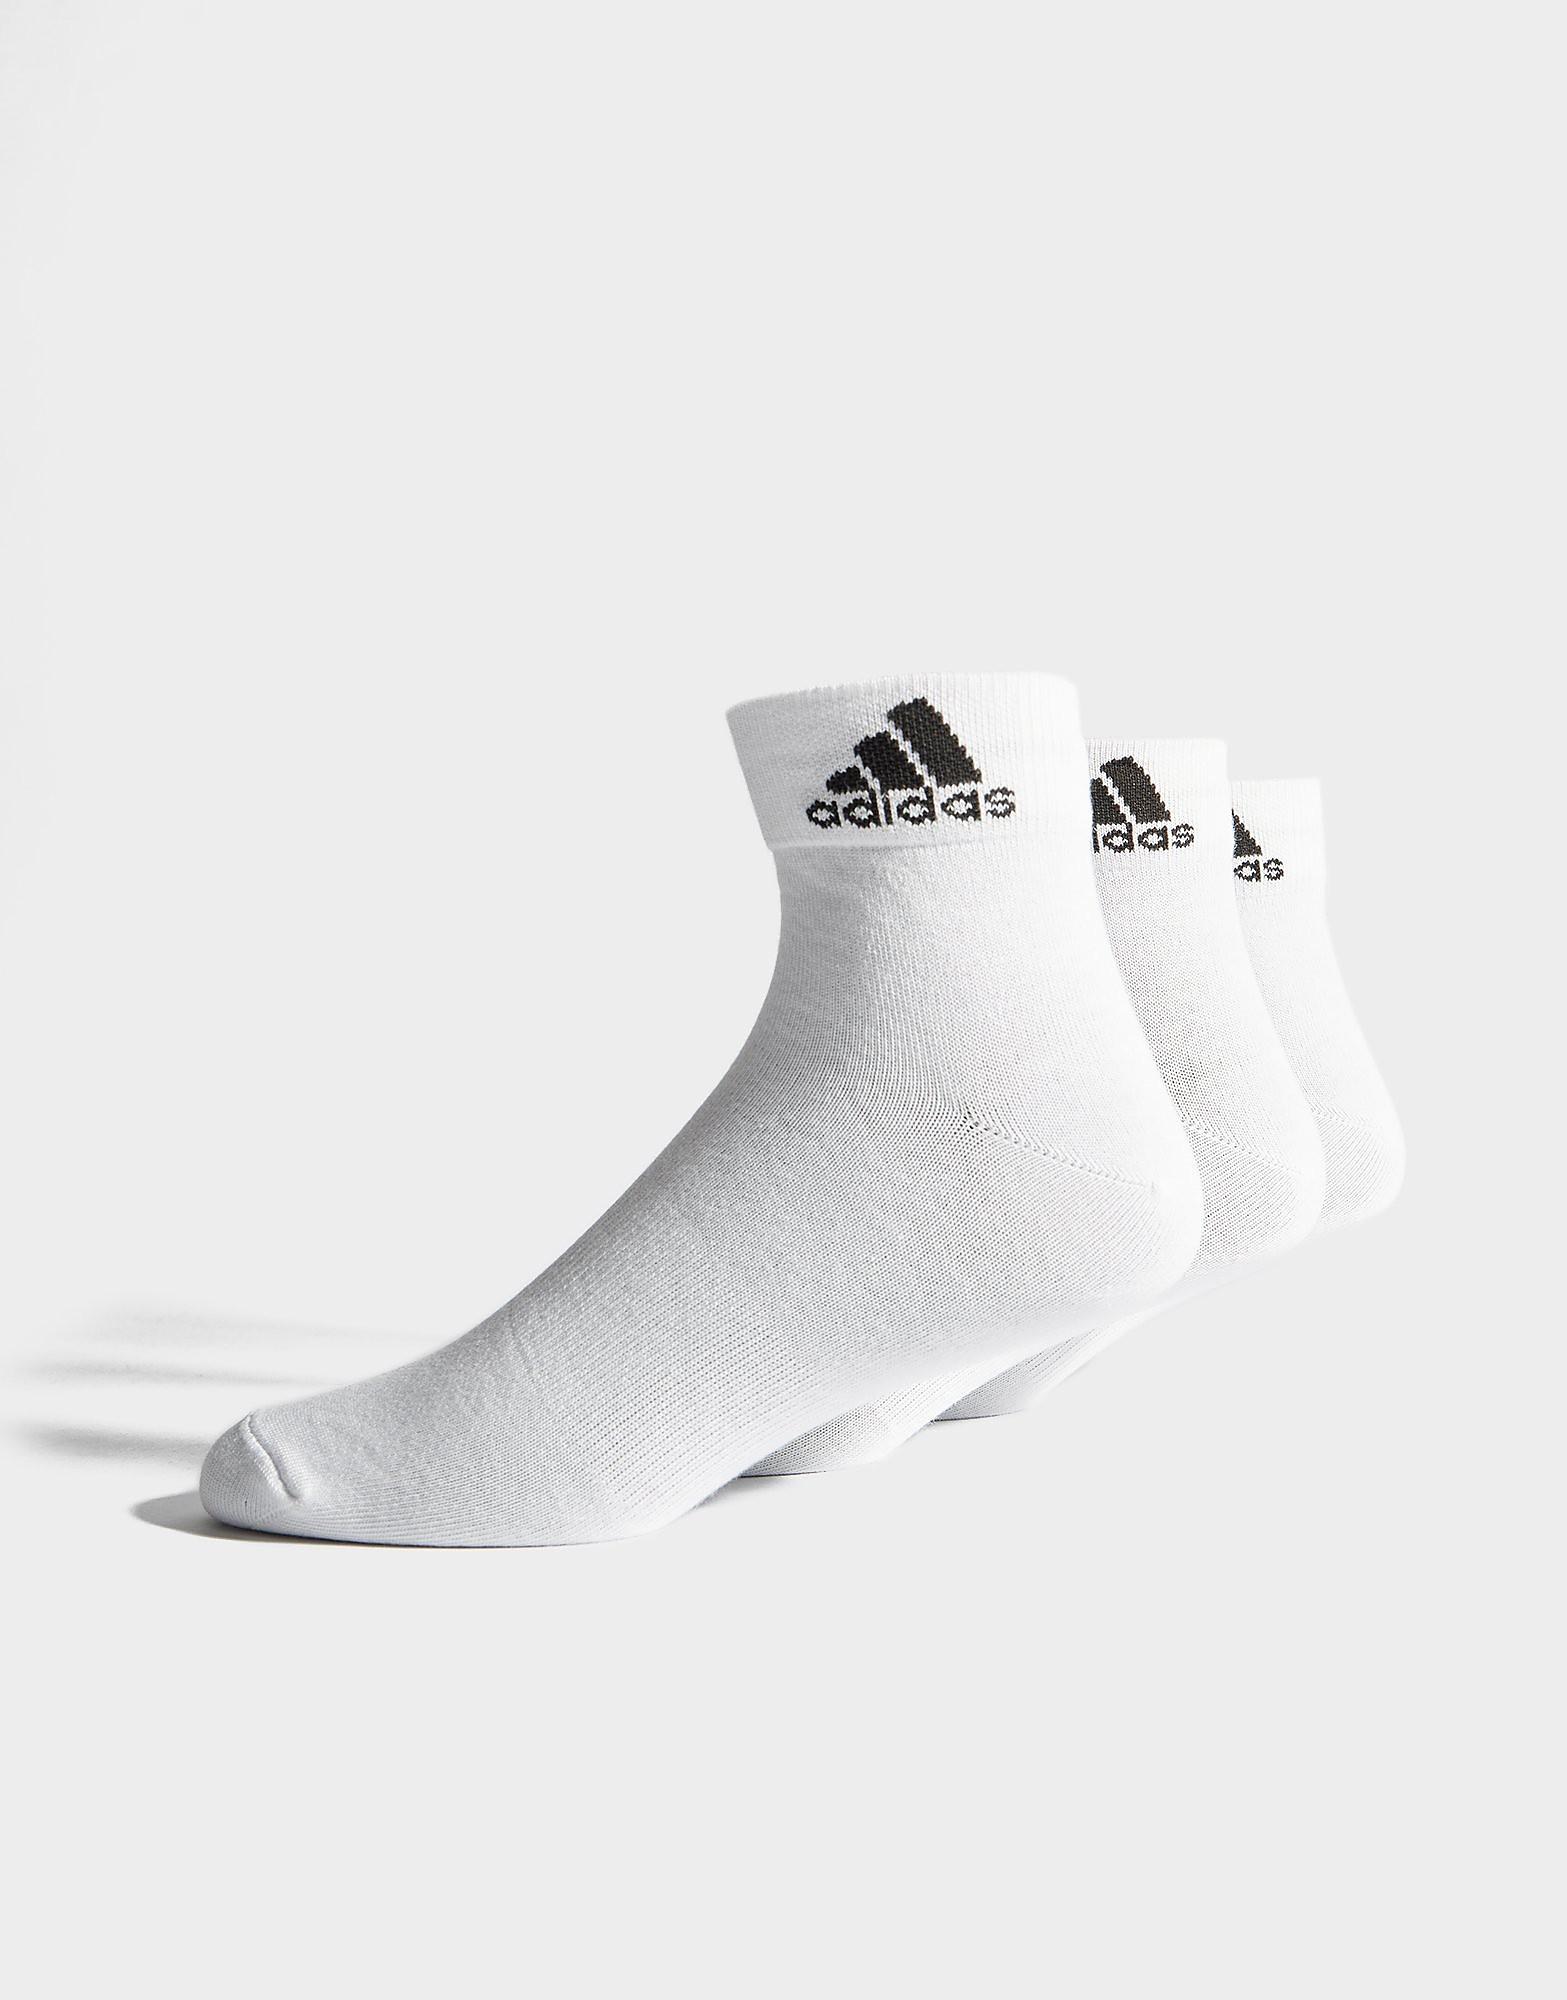 adidas pack de 3 calcetines tobilleros Sport